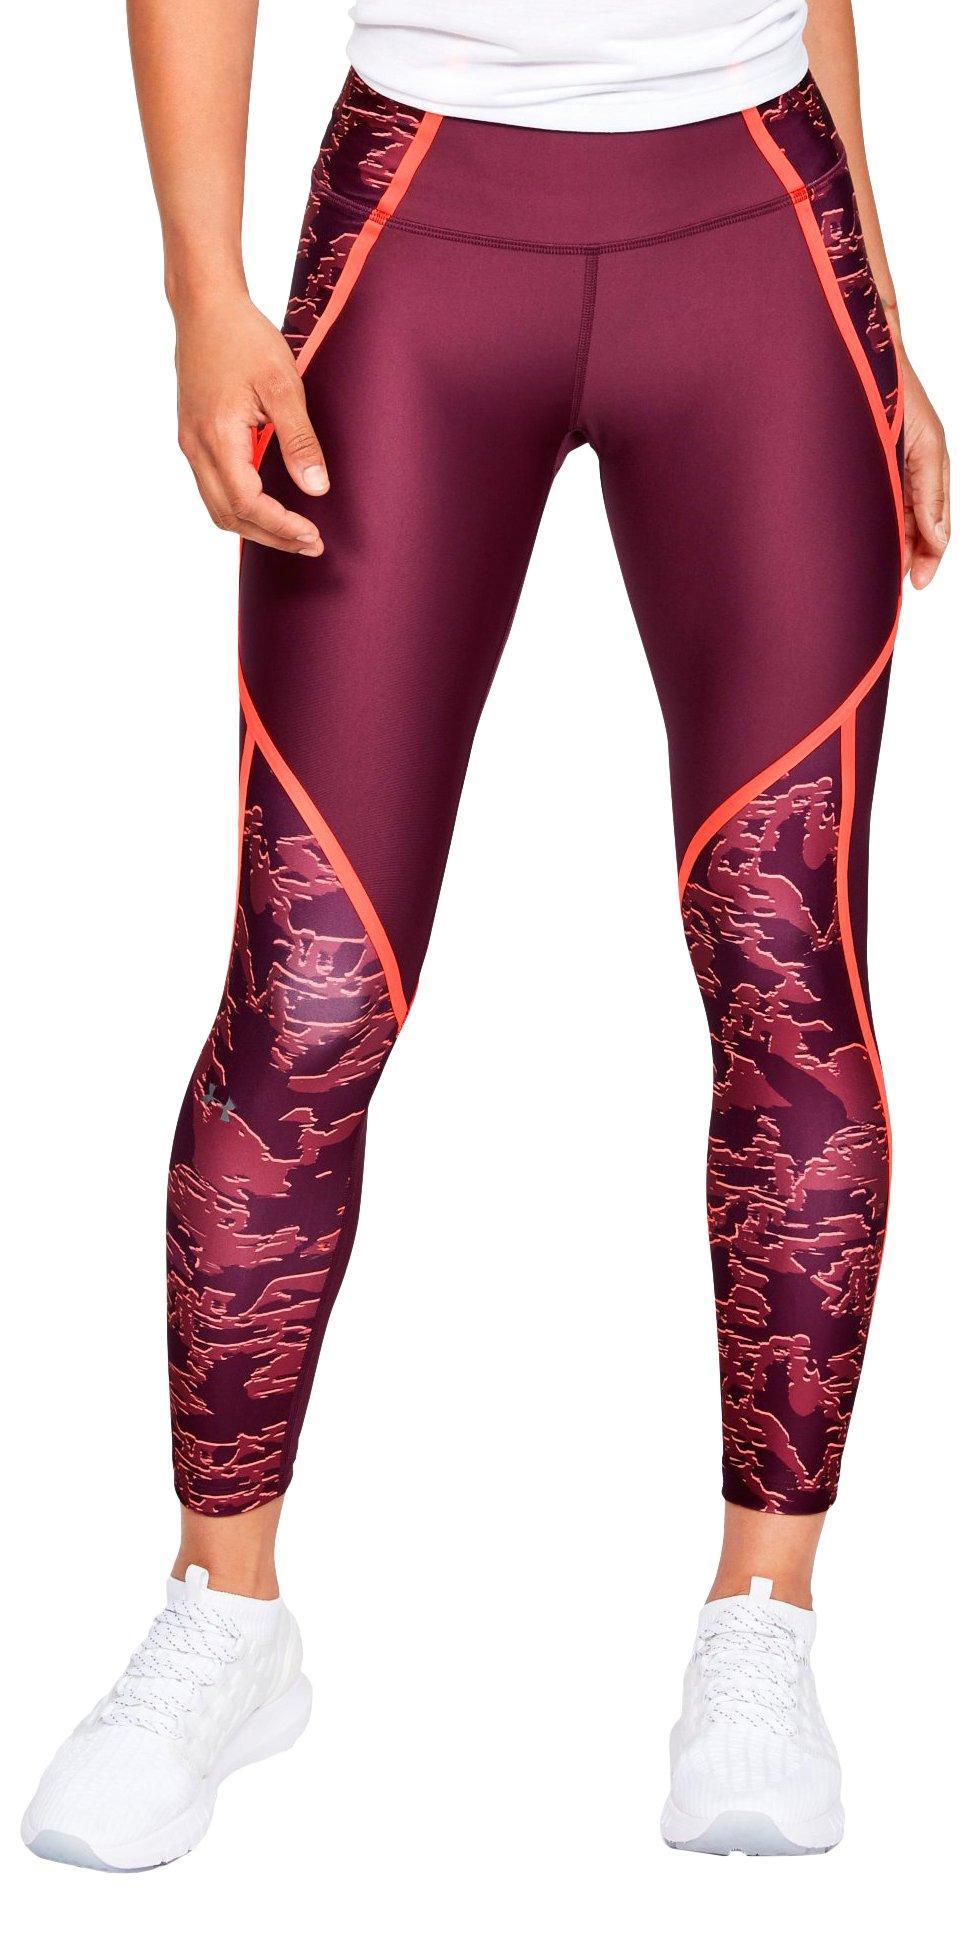 Under Armour Damen Fitness-Sport-Leggings HeatGear Crop-Leggings schwarz orange